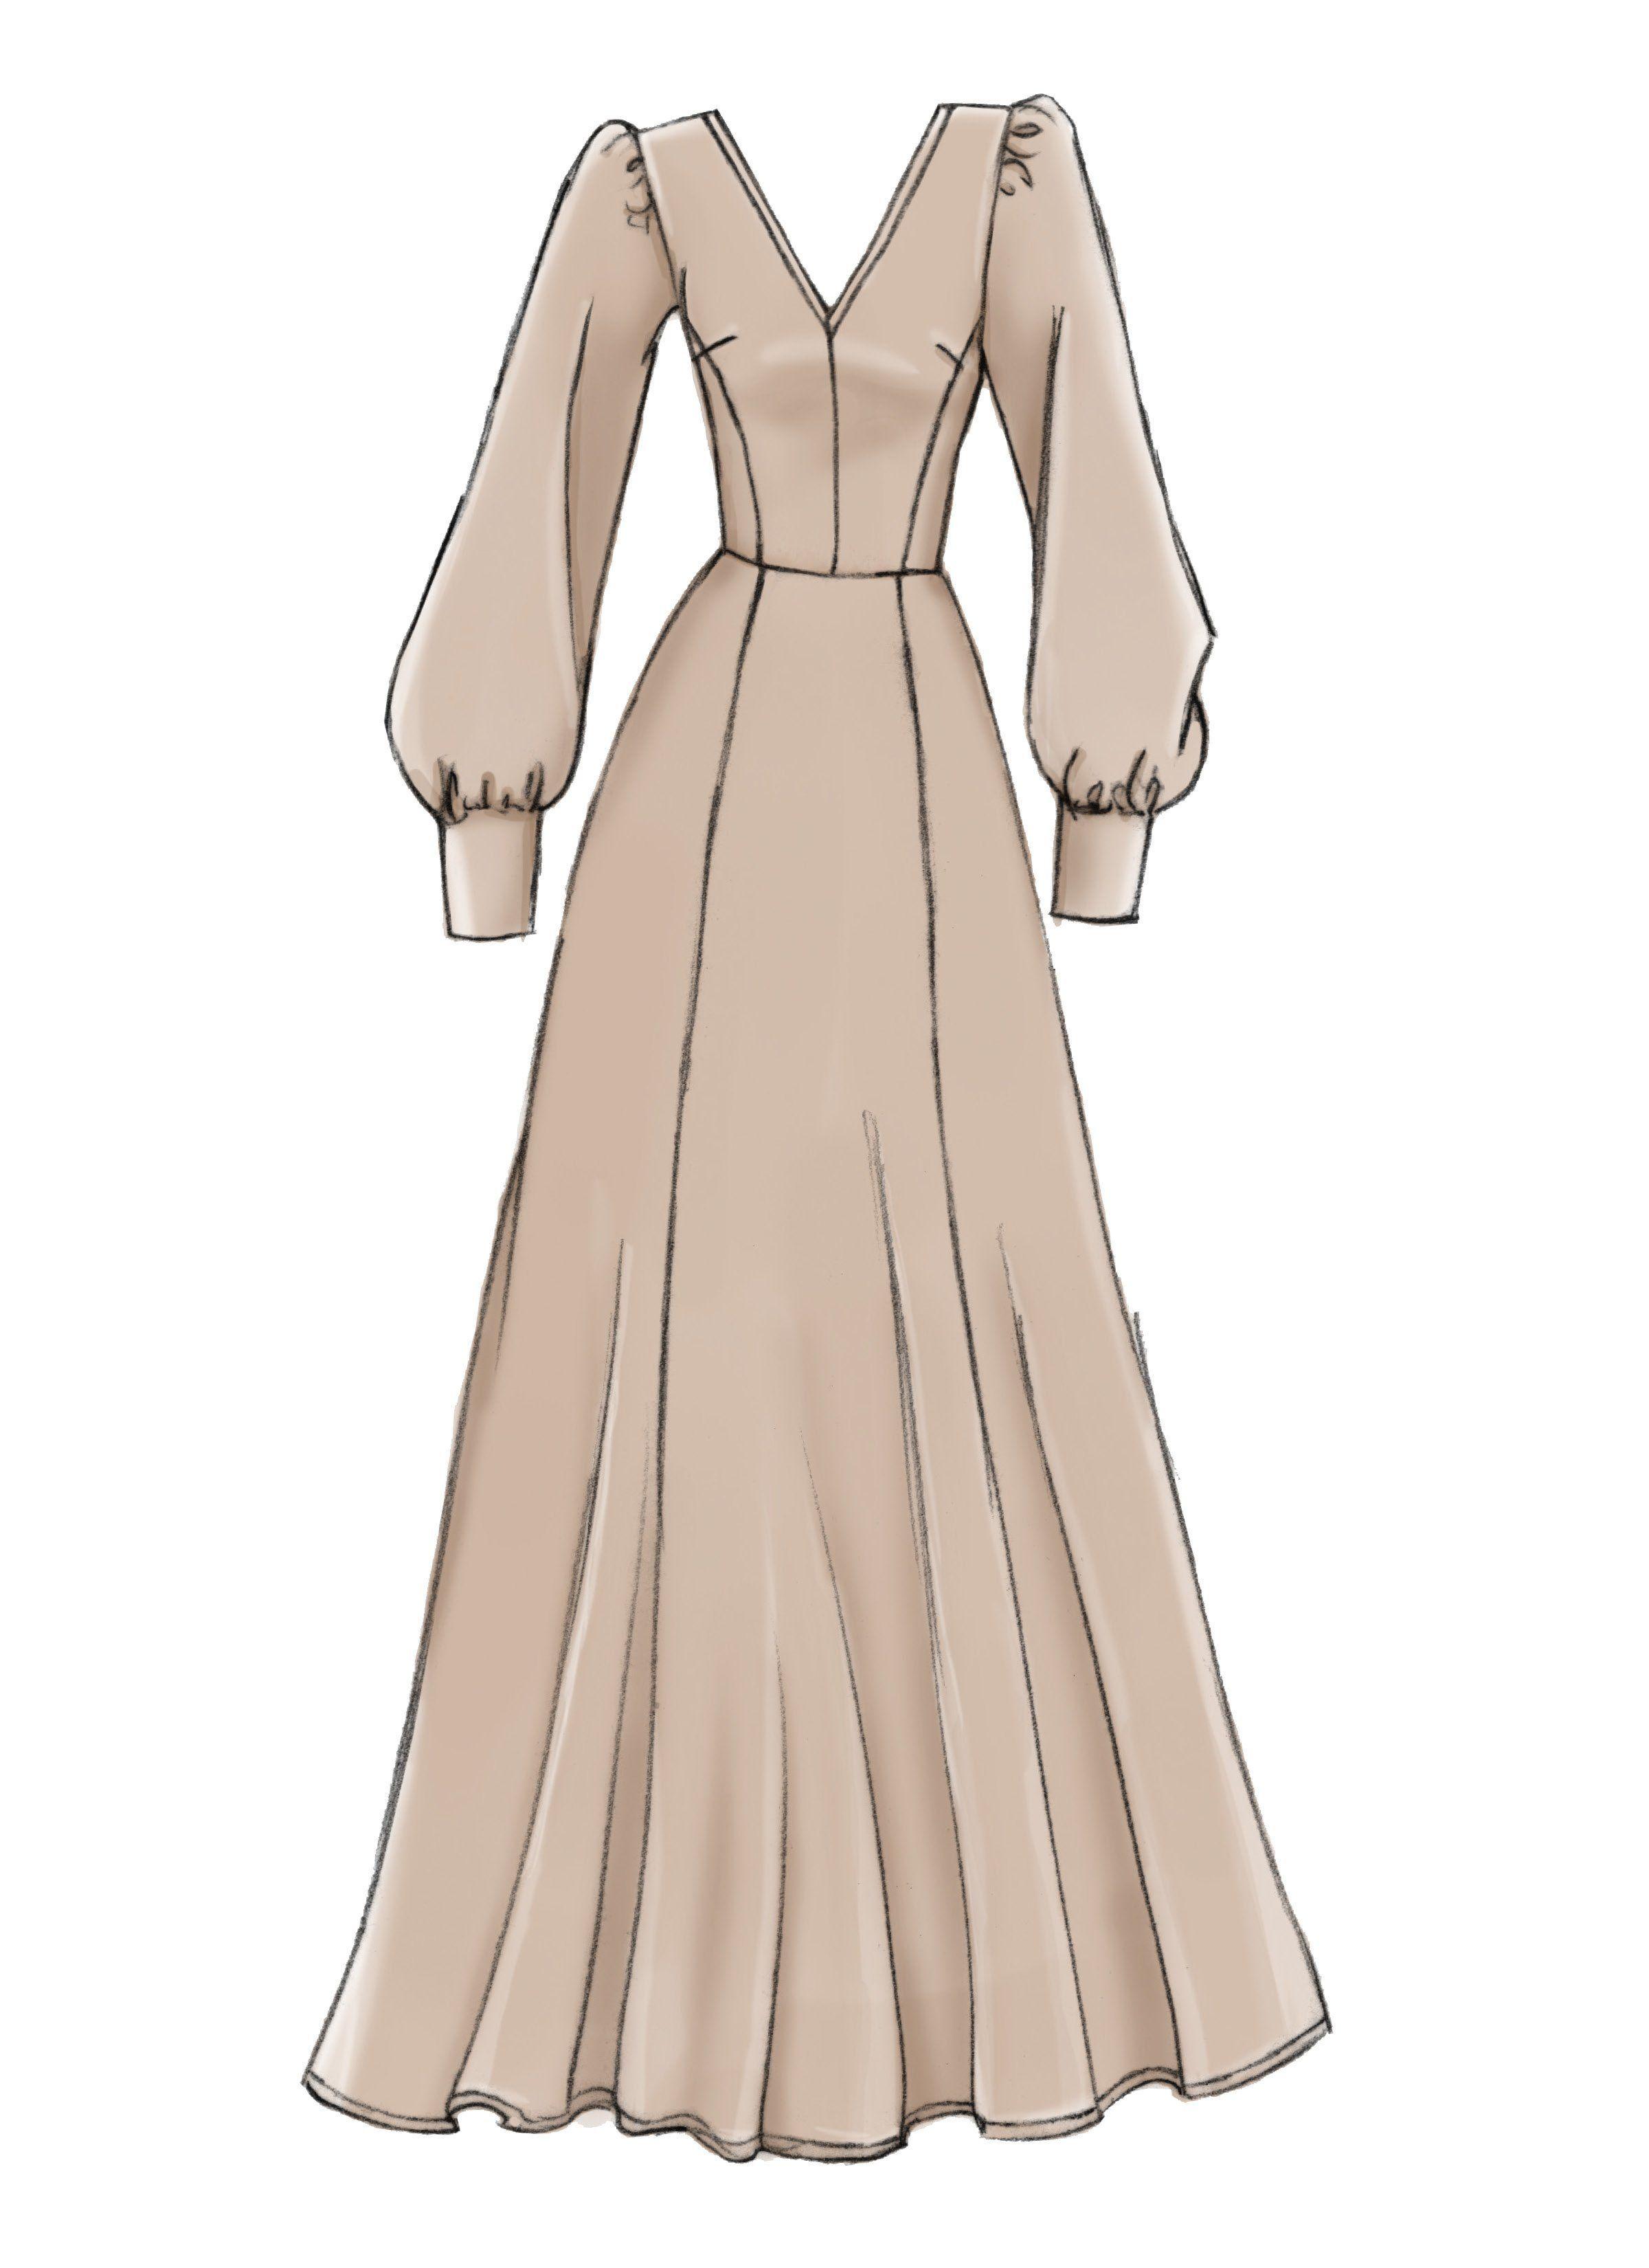 Vogue Pattern 9328 Misses Dress | Vogue Easy Options, Custom Fit